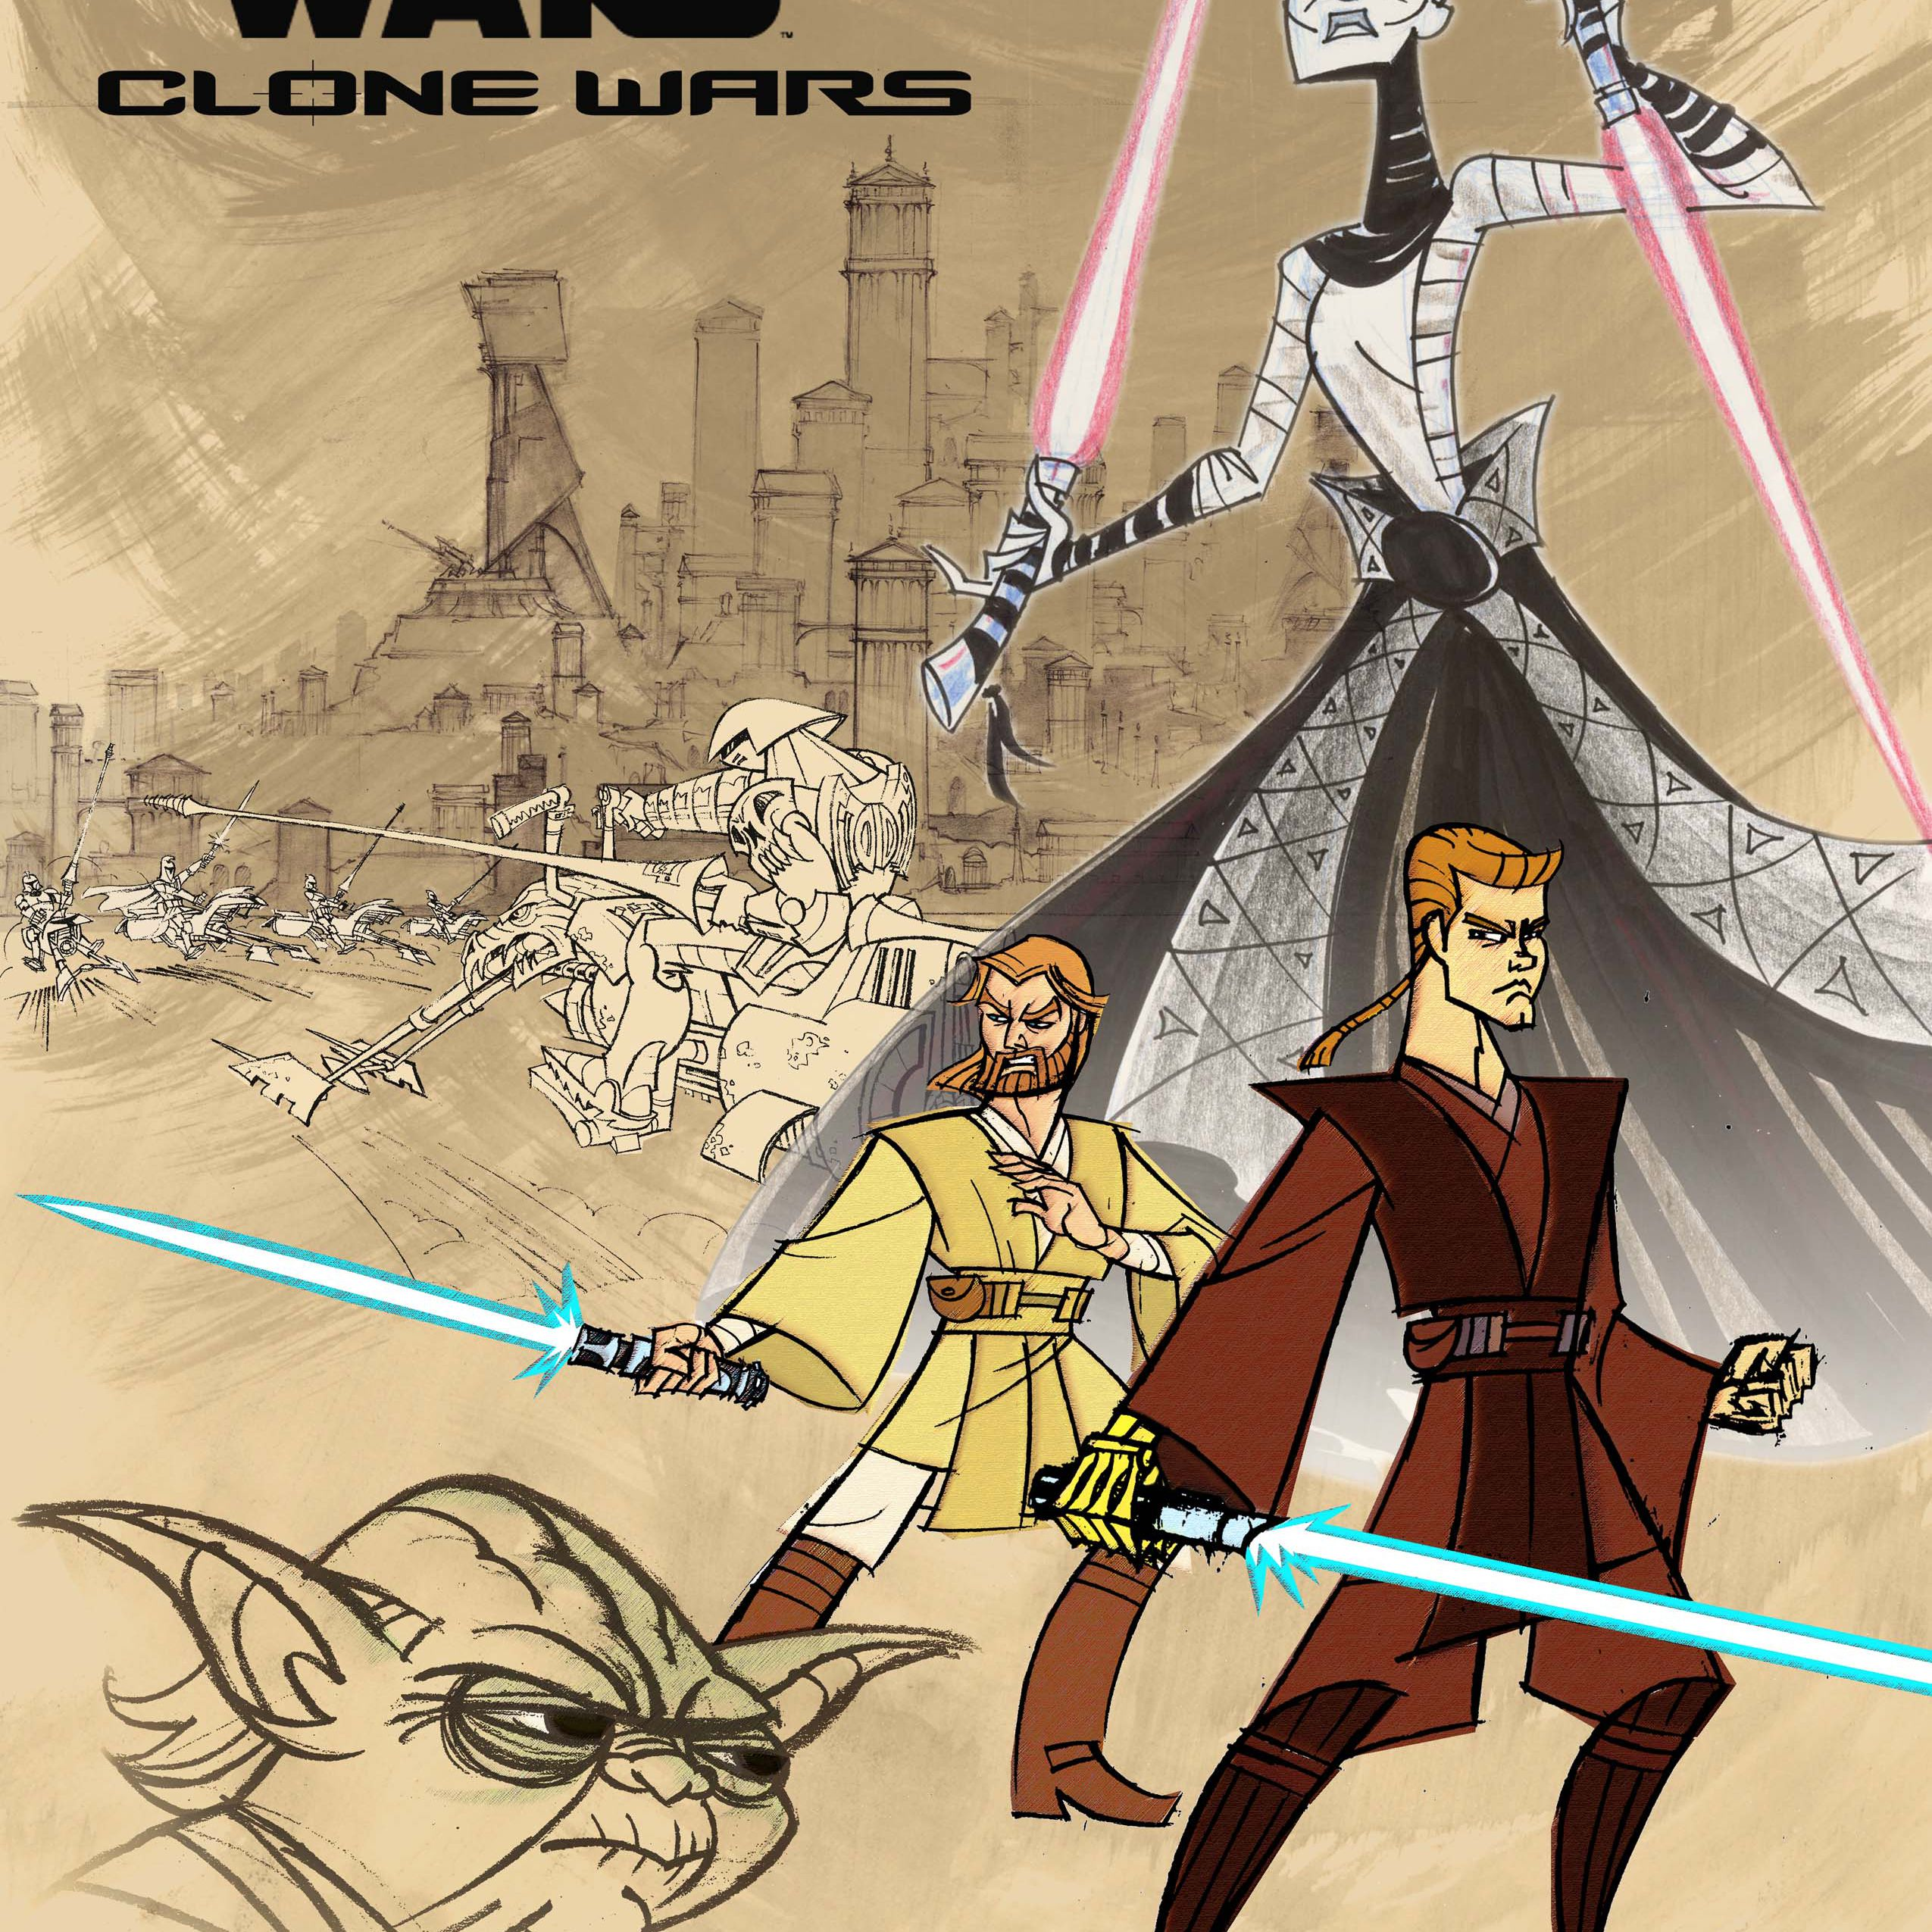 'Clone Wars' Poster